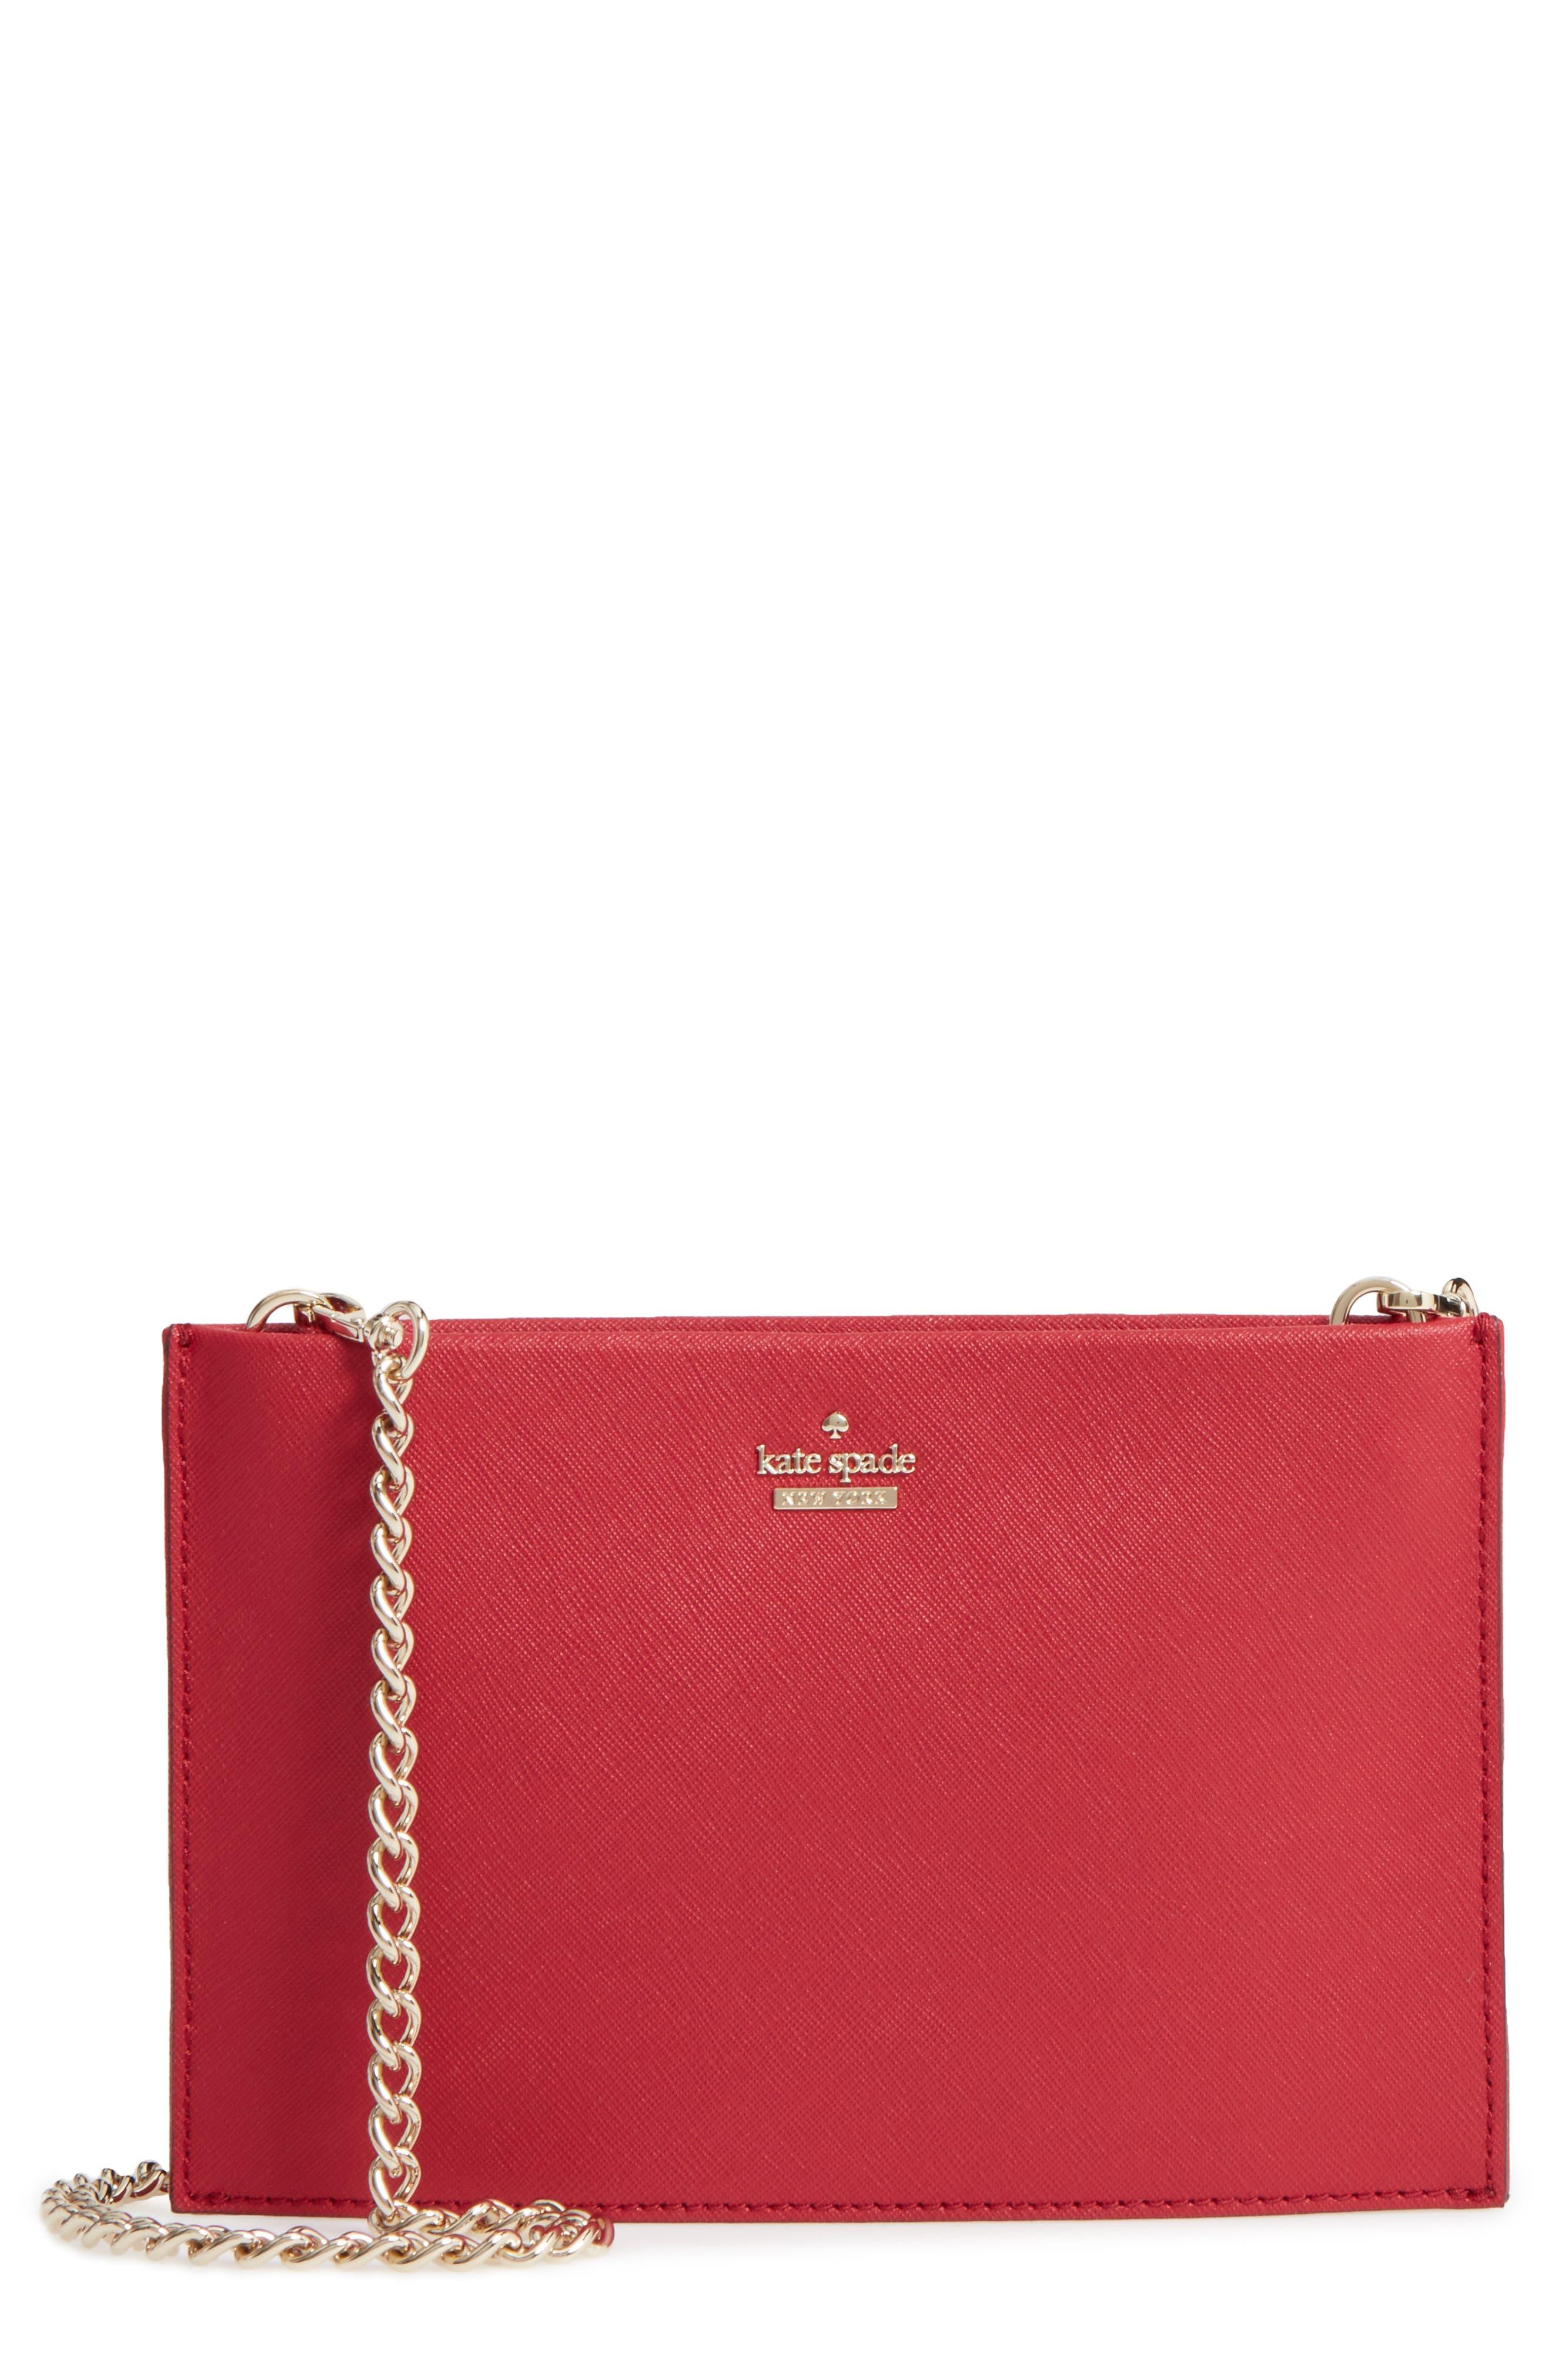 cameron street - mini sima leather shoulder bag,                         Main,                         color, Rosso